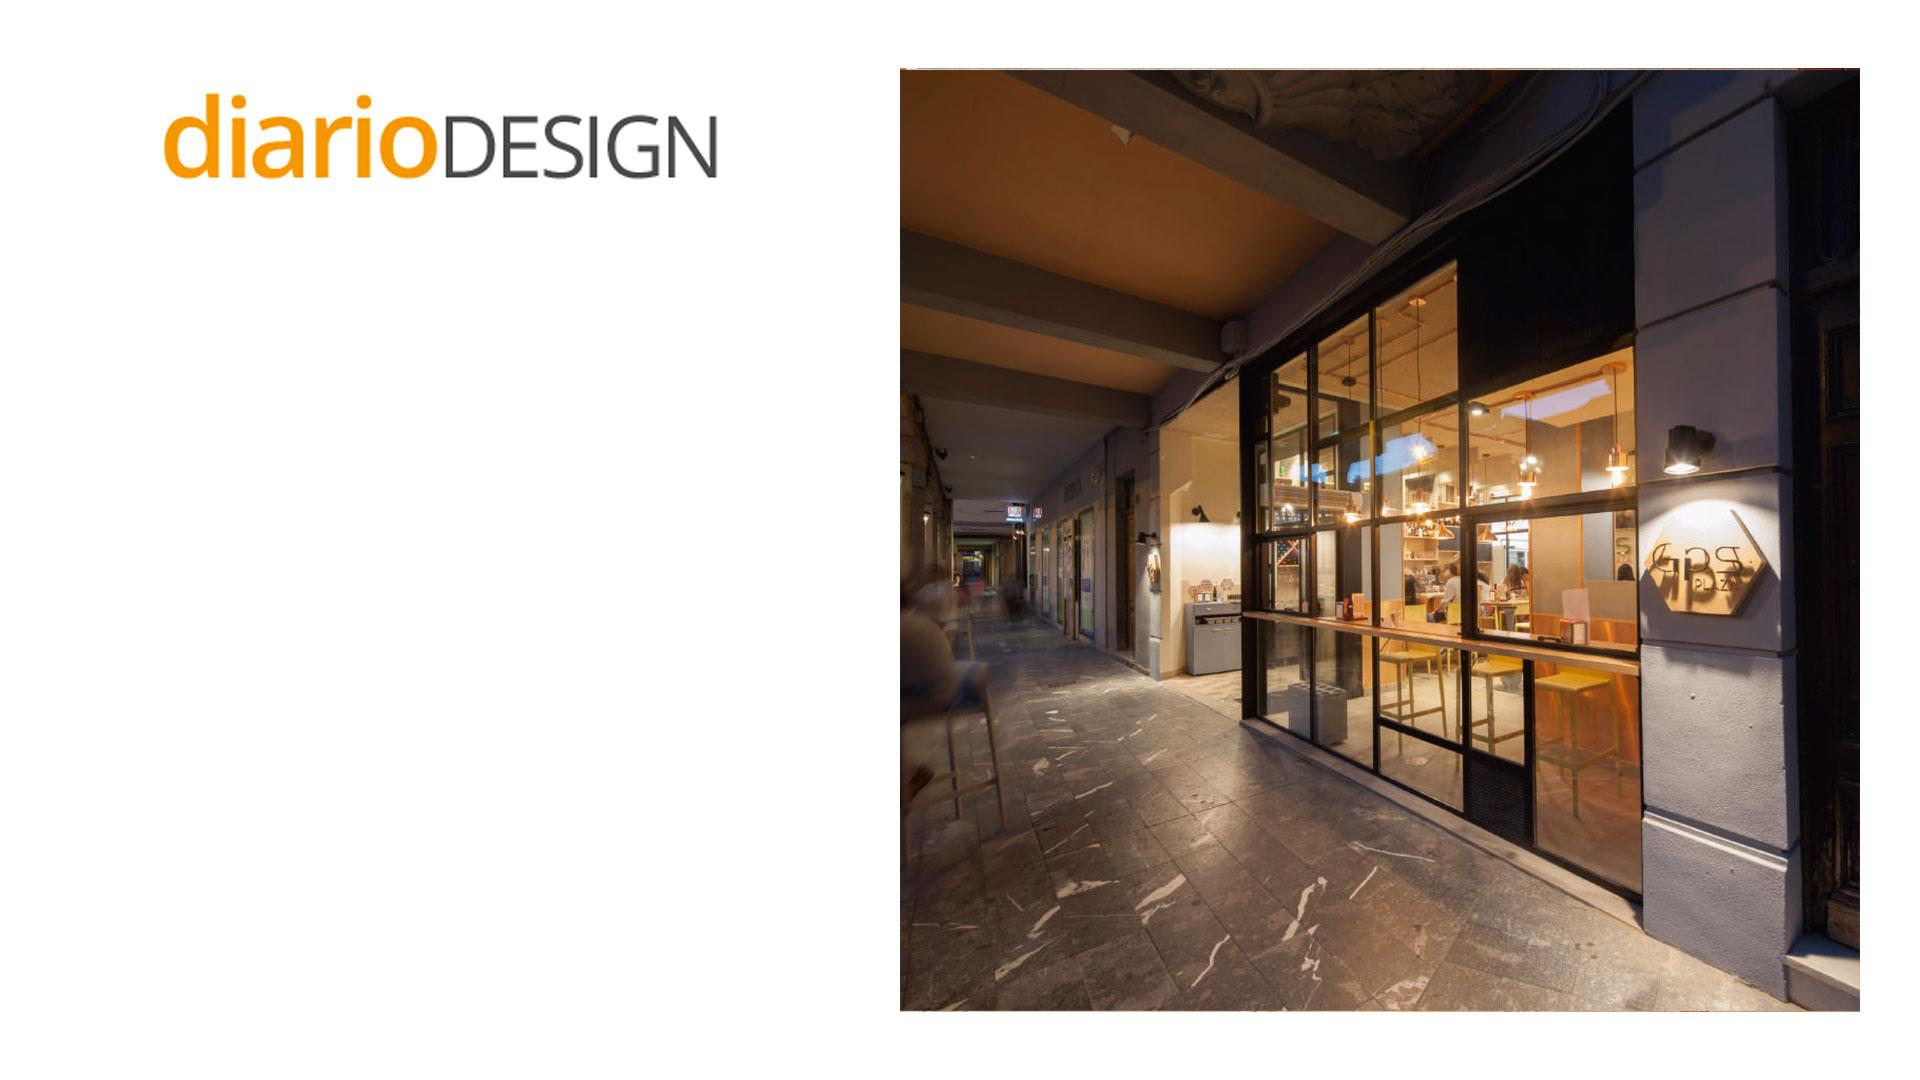 diario-design-gps-plaza